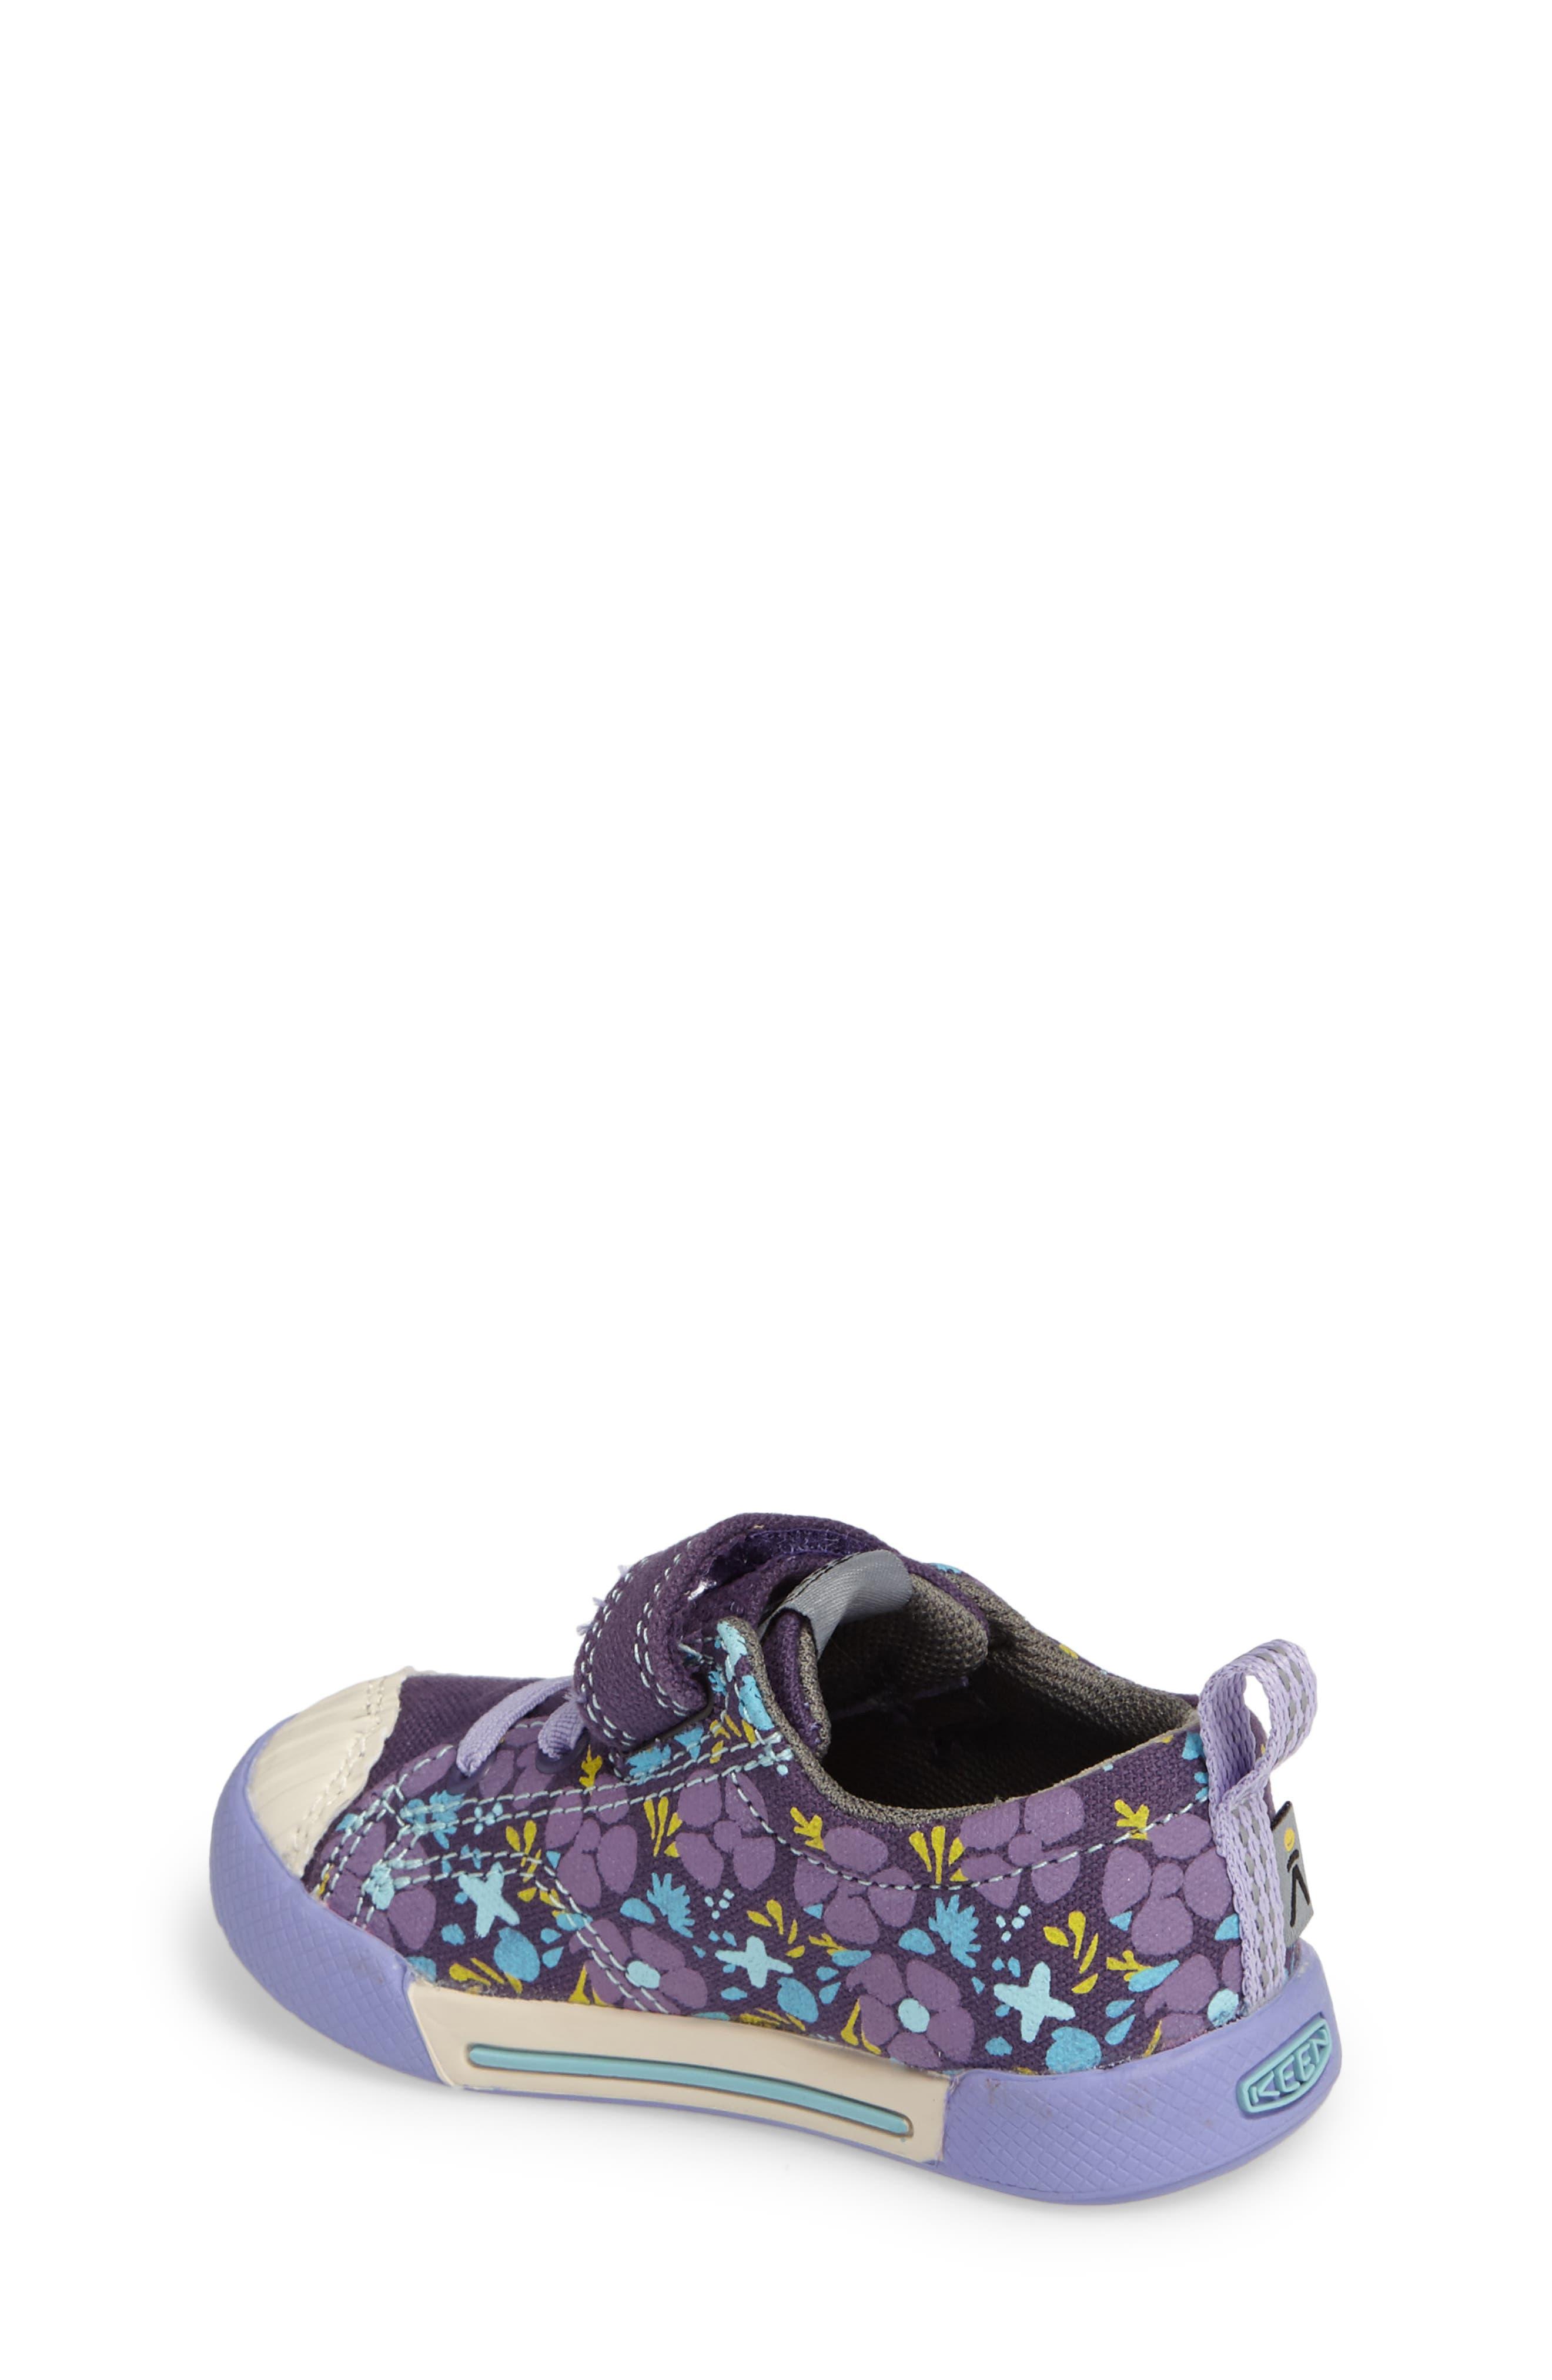 Alternate Image 2  - Keen Encanto Finley Sneaker (Baby, Walker, Toddler, Little Kid & Big Kid)